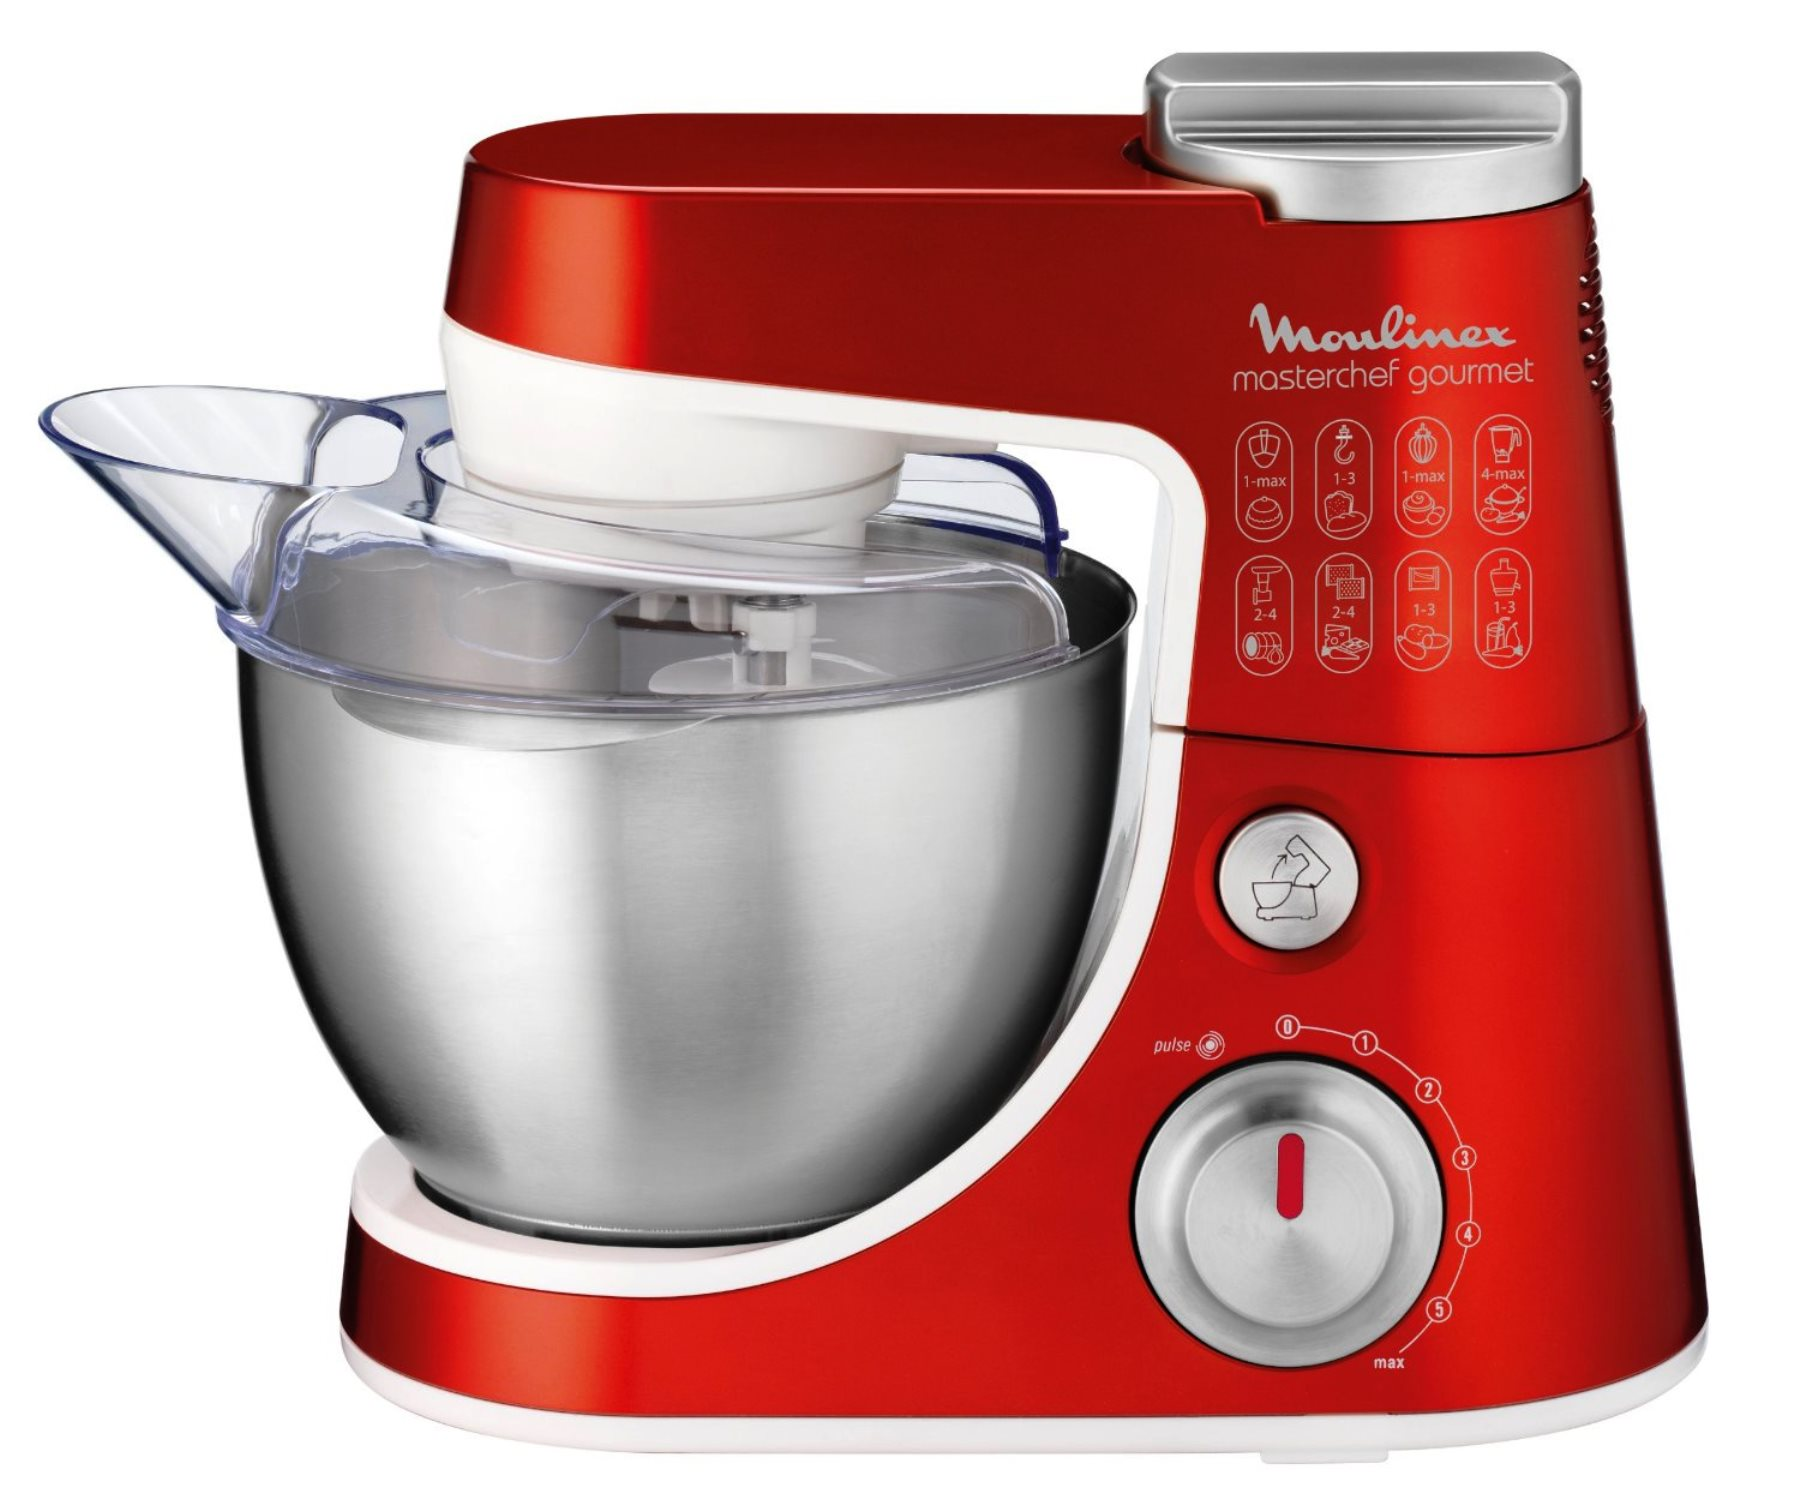 Moulinex qa403gb1 masterchef gourmet impastatrice e robot da cucina - Prezzo robot da cucina moulinex ...